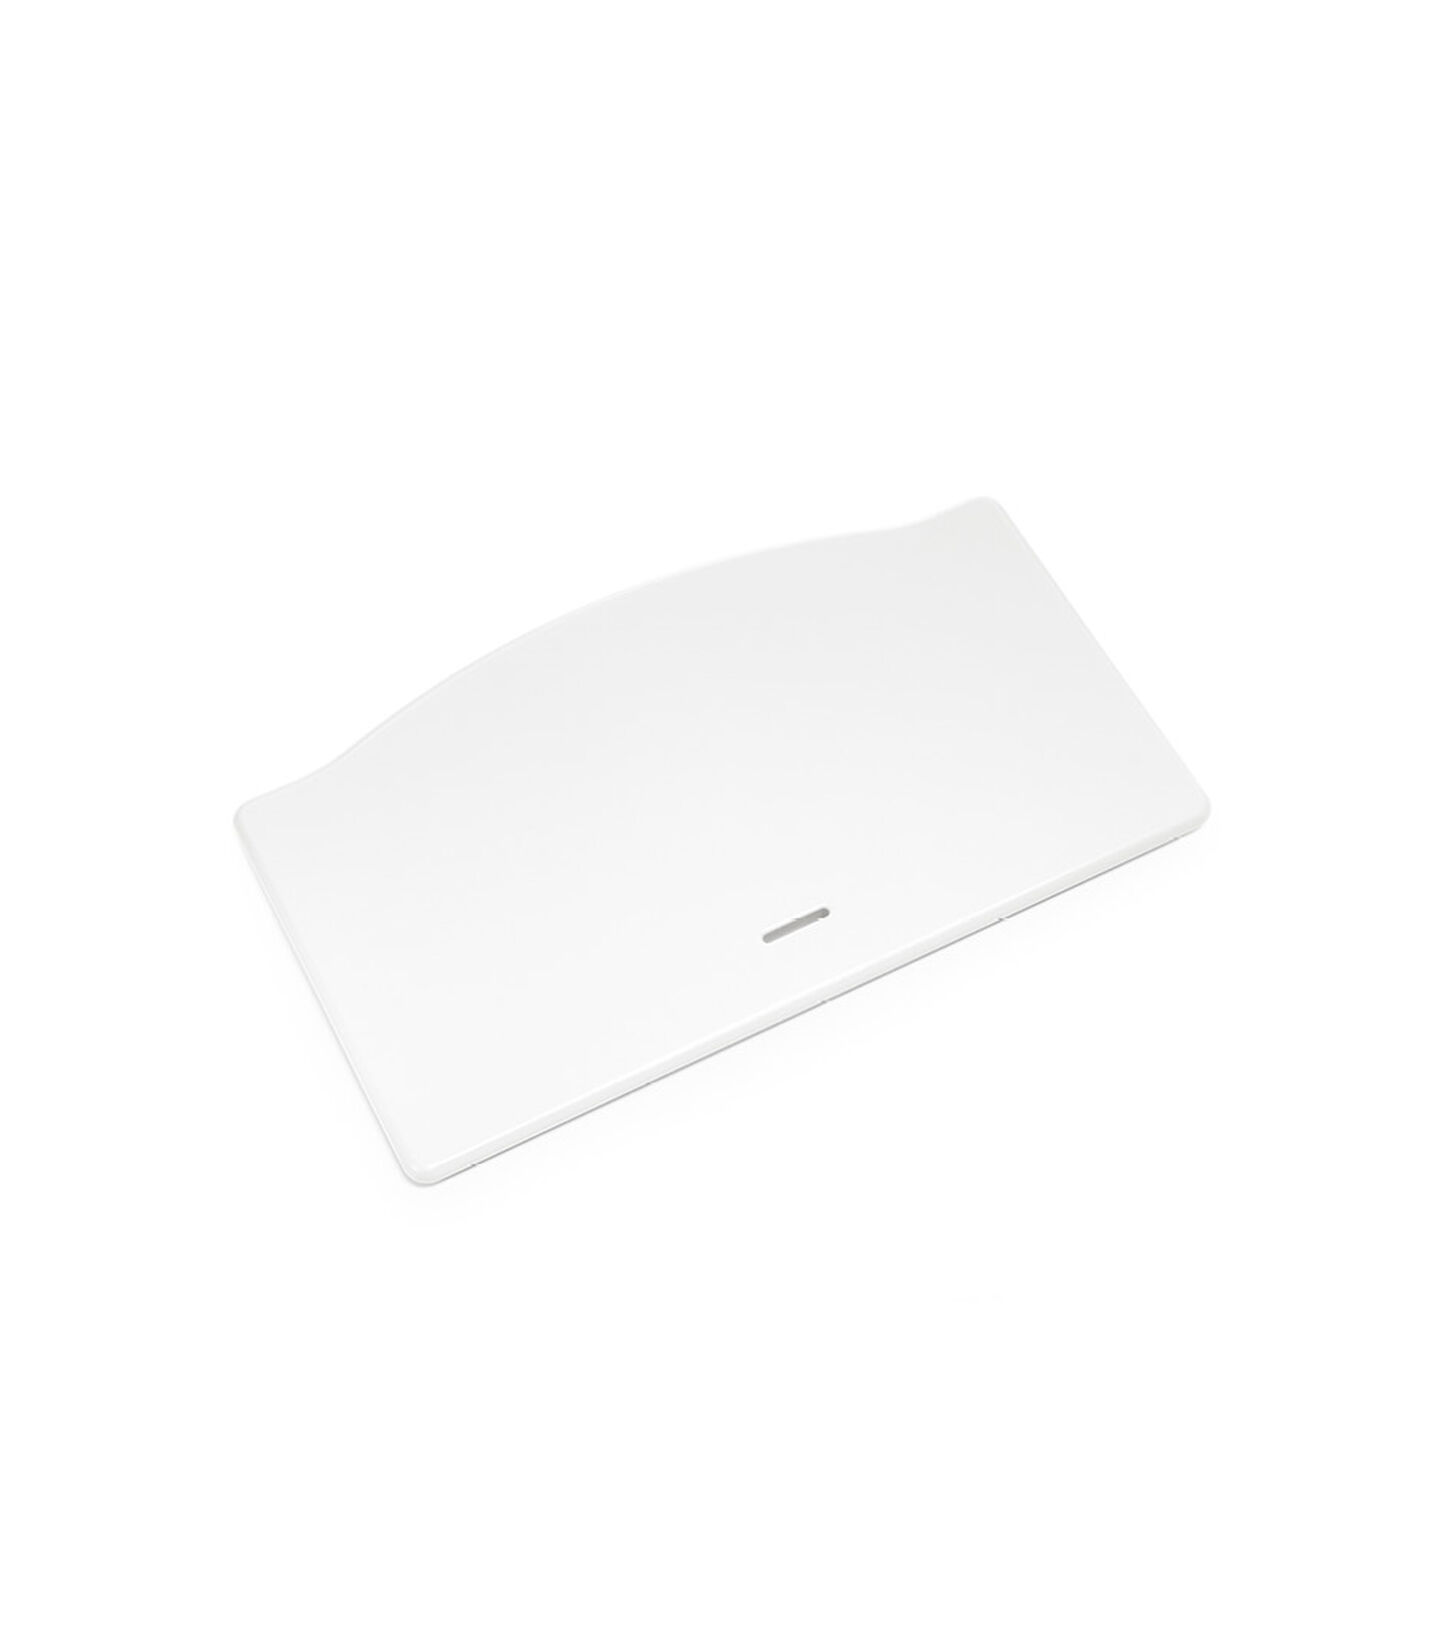 Tripp Trapp® Zitplaat White, White, mainview view 1